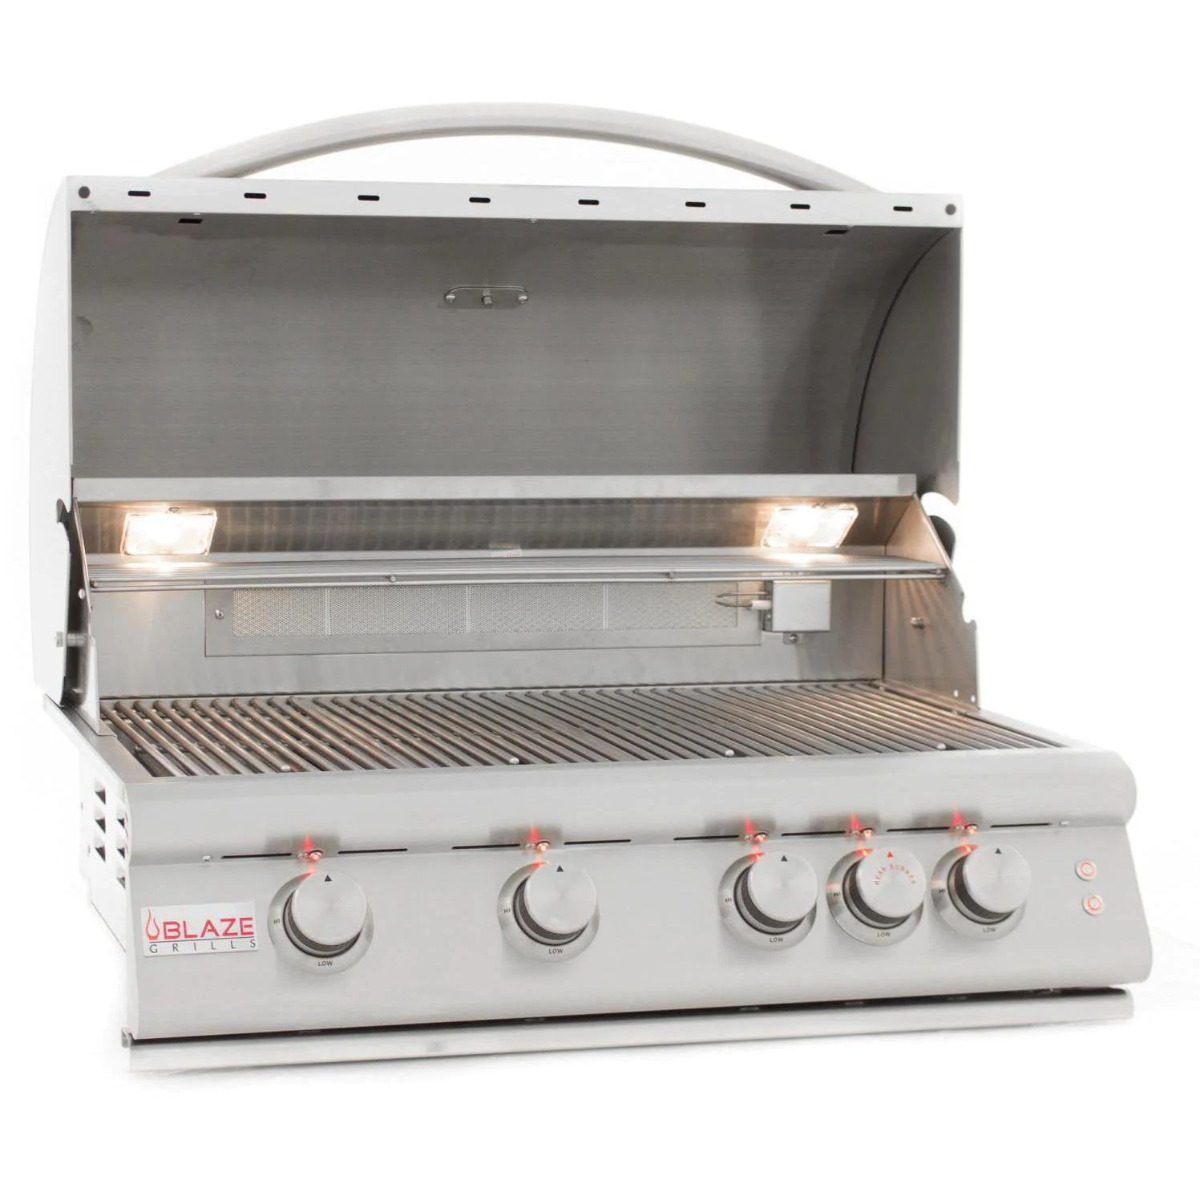 Blaze Premium LTE 32-Inch 4-Burner Built-In Propane Grill with Rotisserie, Rear Infrared Burner & Grill Lights - blz-4lte2-lp-rt